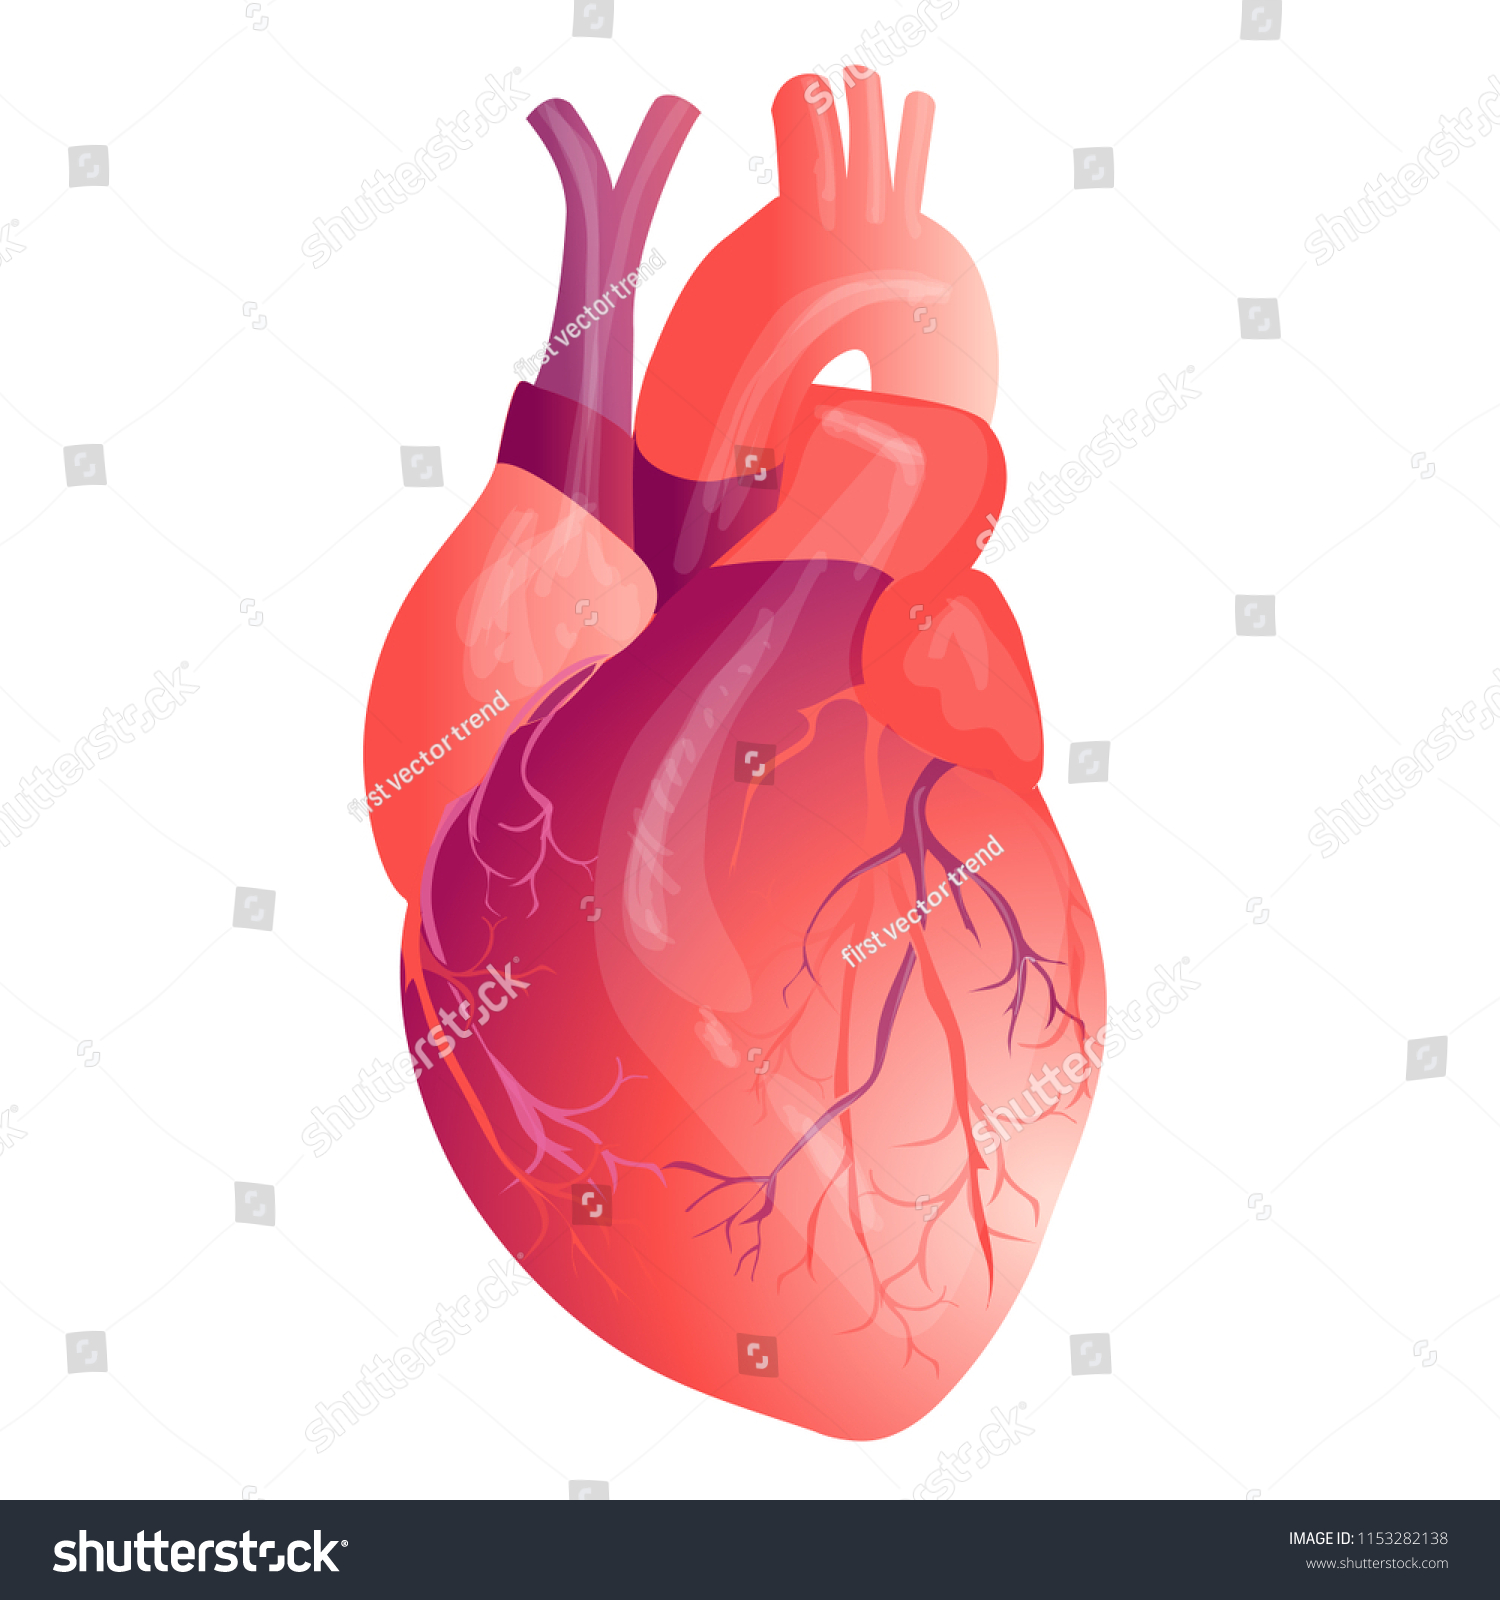 Realistic Human Heart Internal Organ Anatomy Stock Illustration